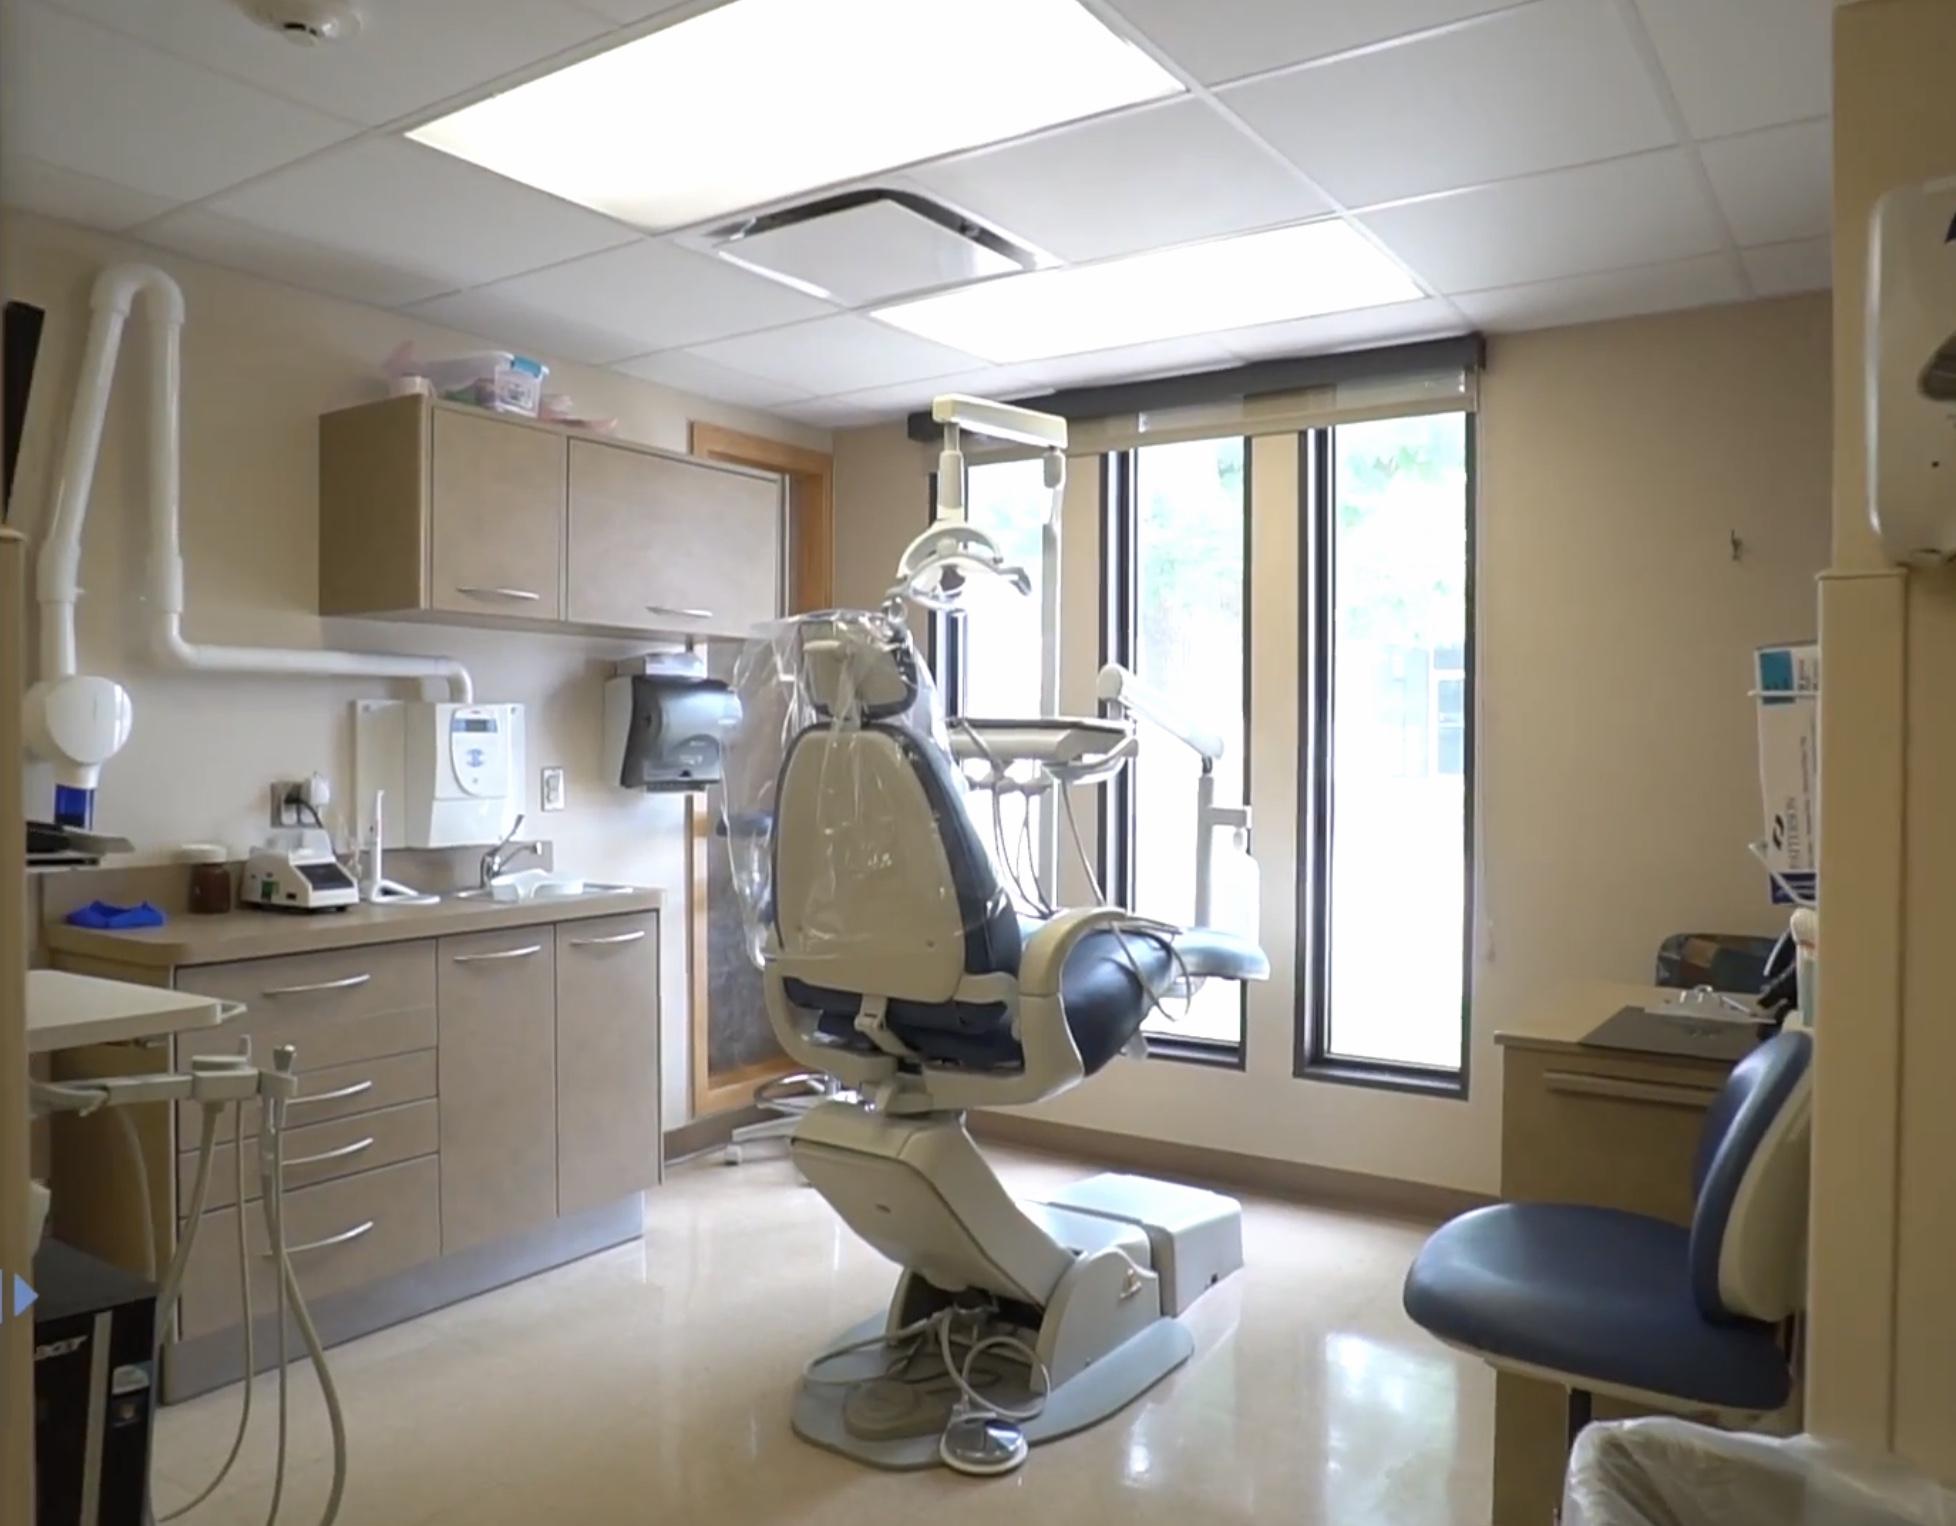 Primary Health Care - Marshalltown Dental Clinic